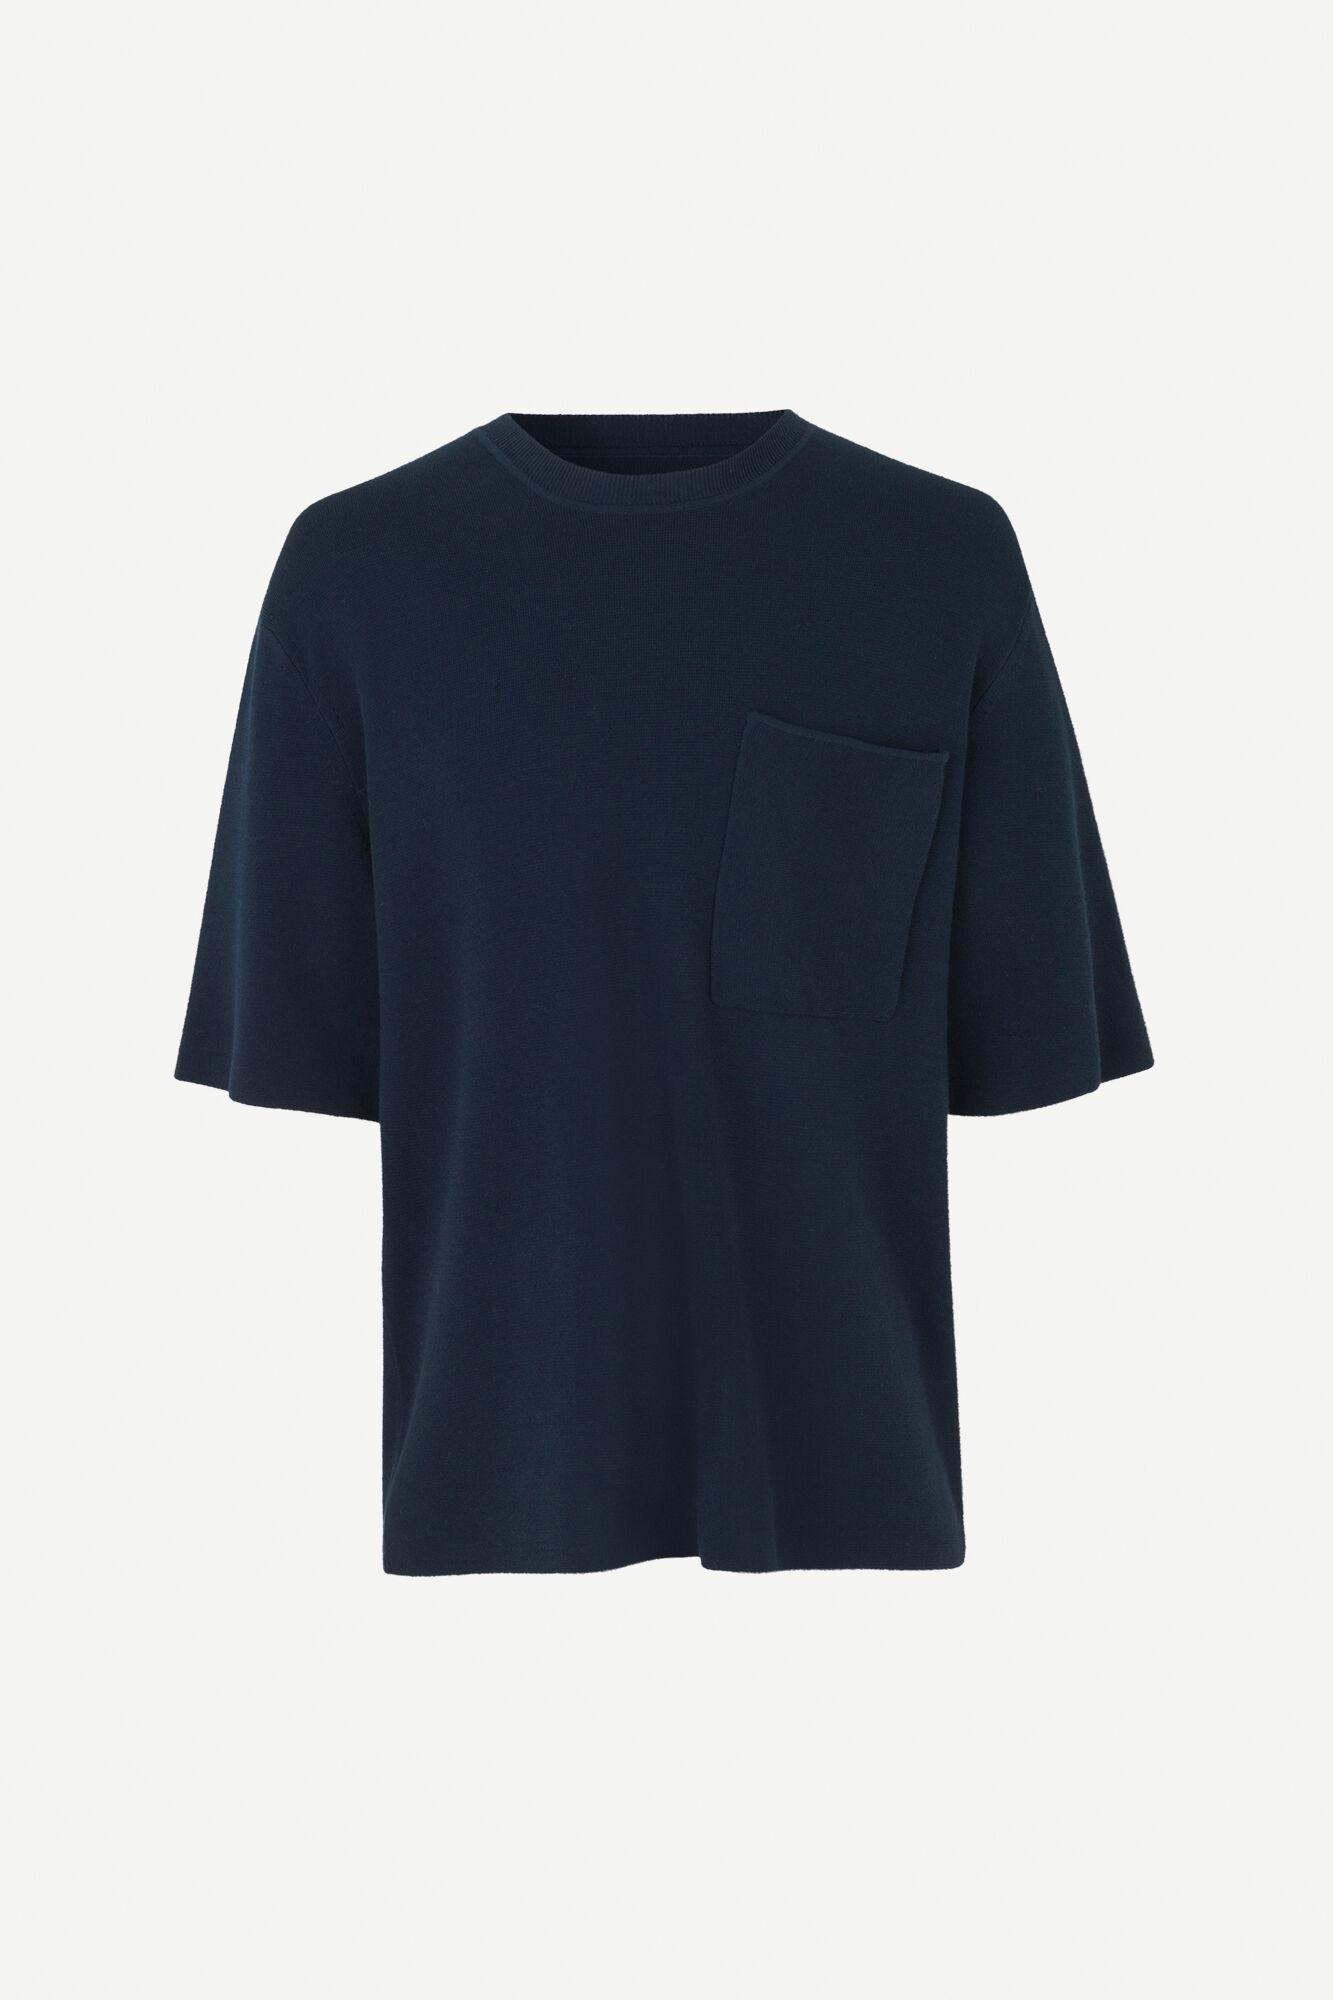 Parma Short Sleeve Sweatshirt Night Sky Blue-1